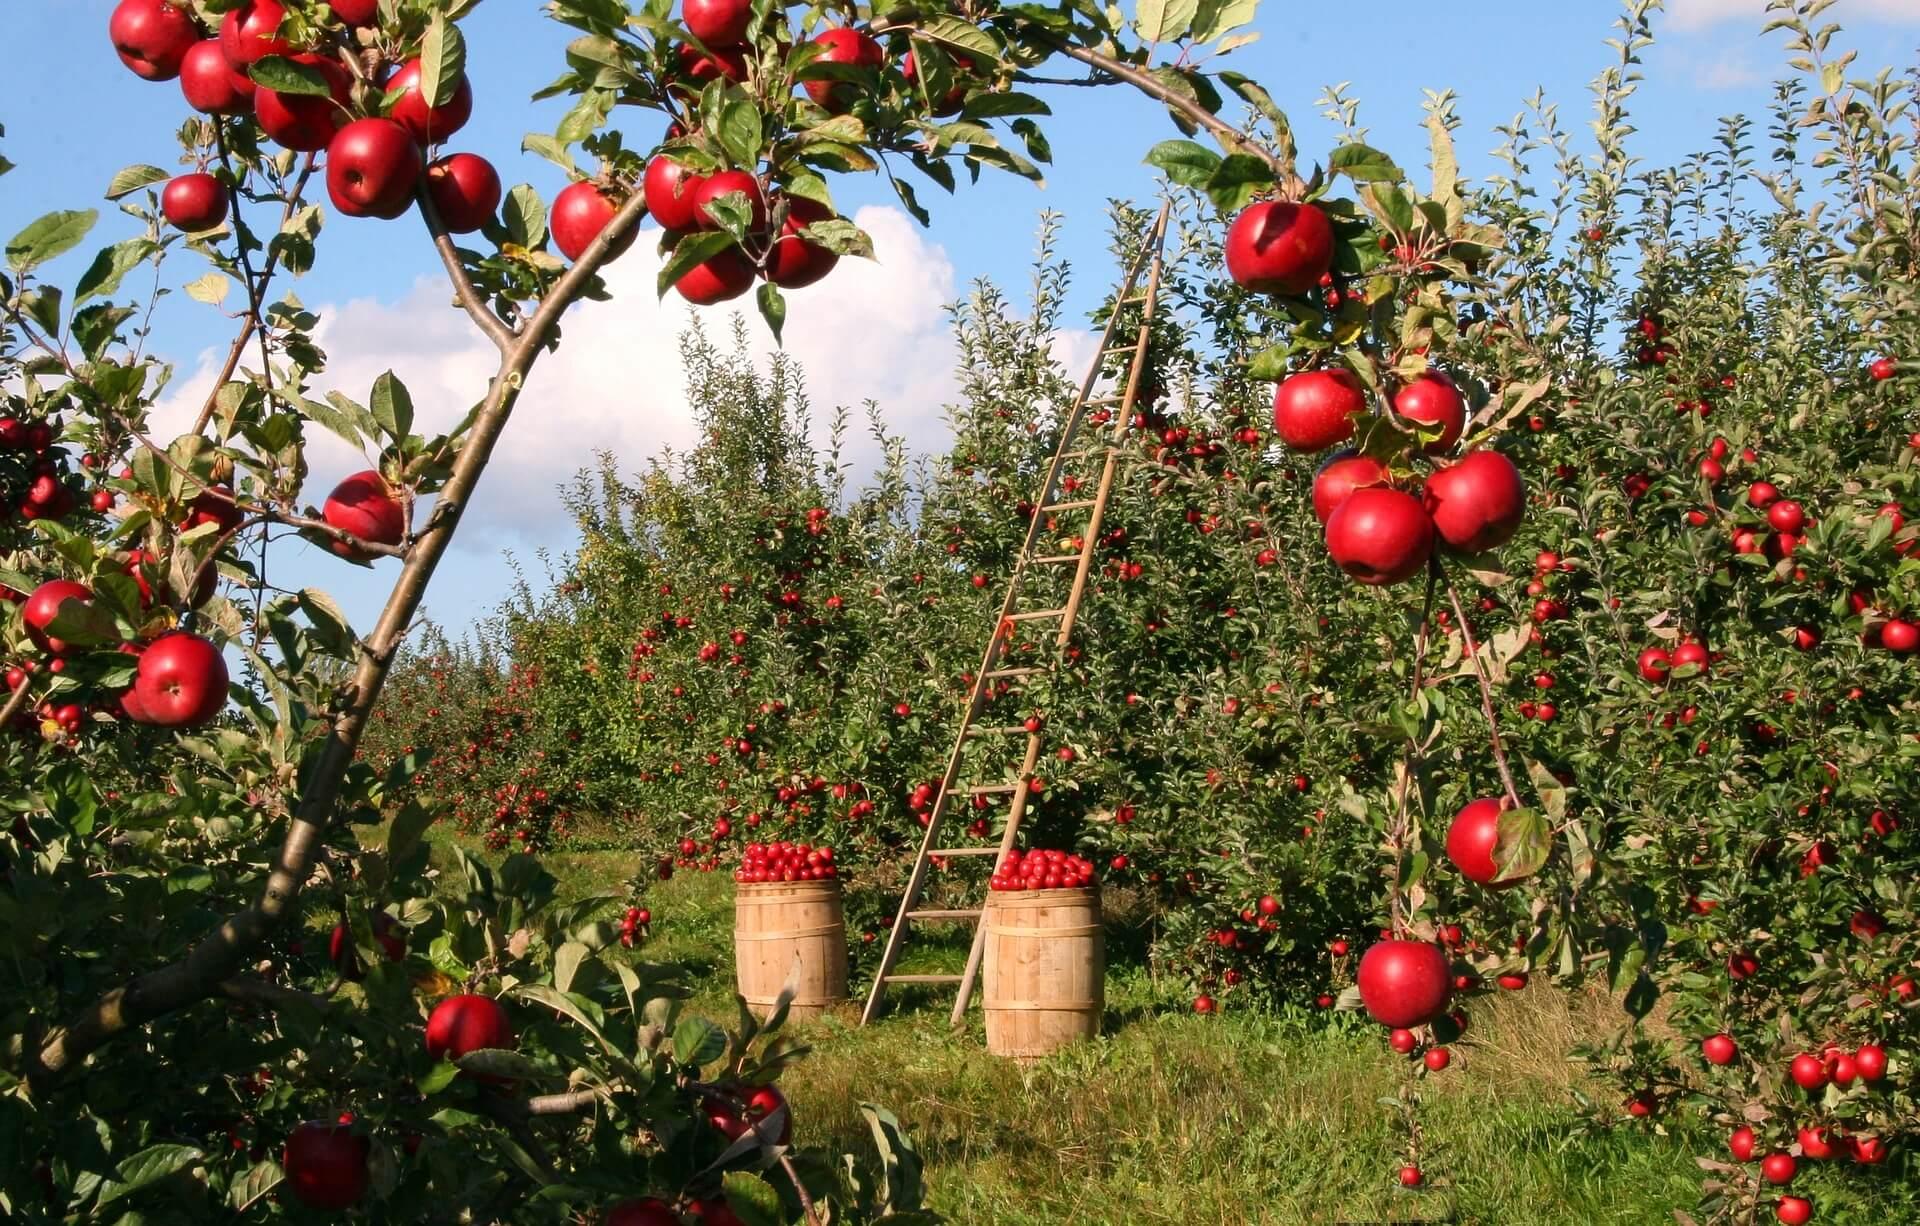 Блог про сільське господарство